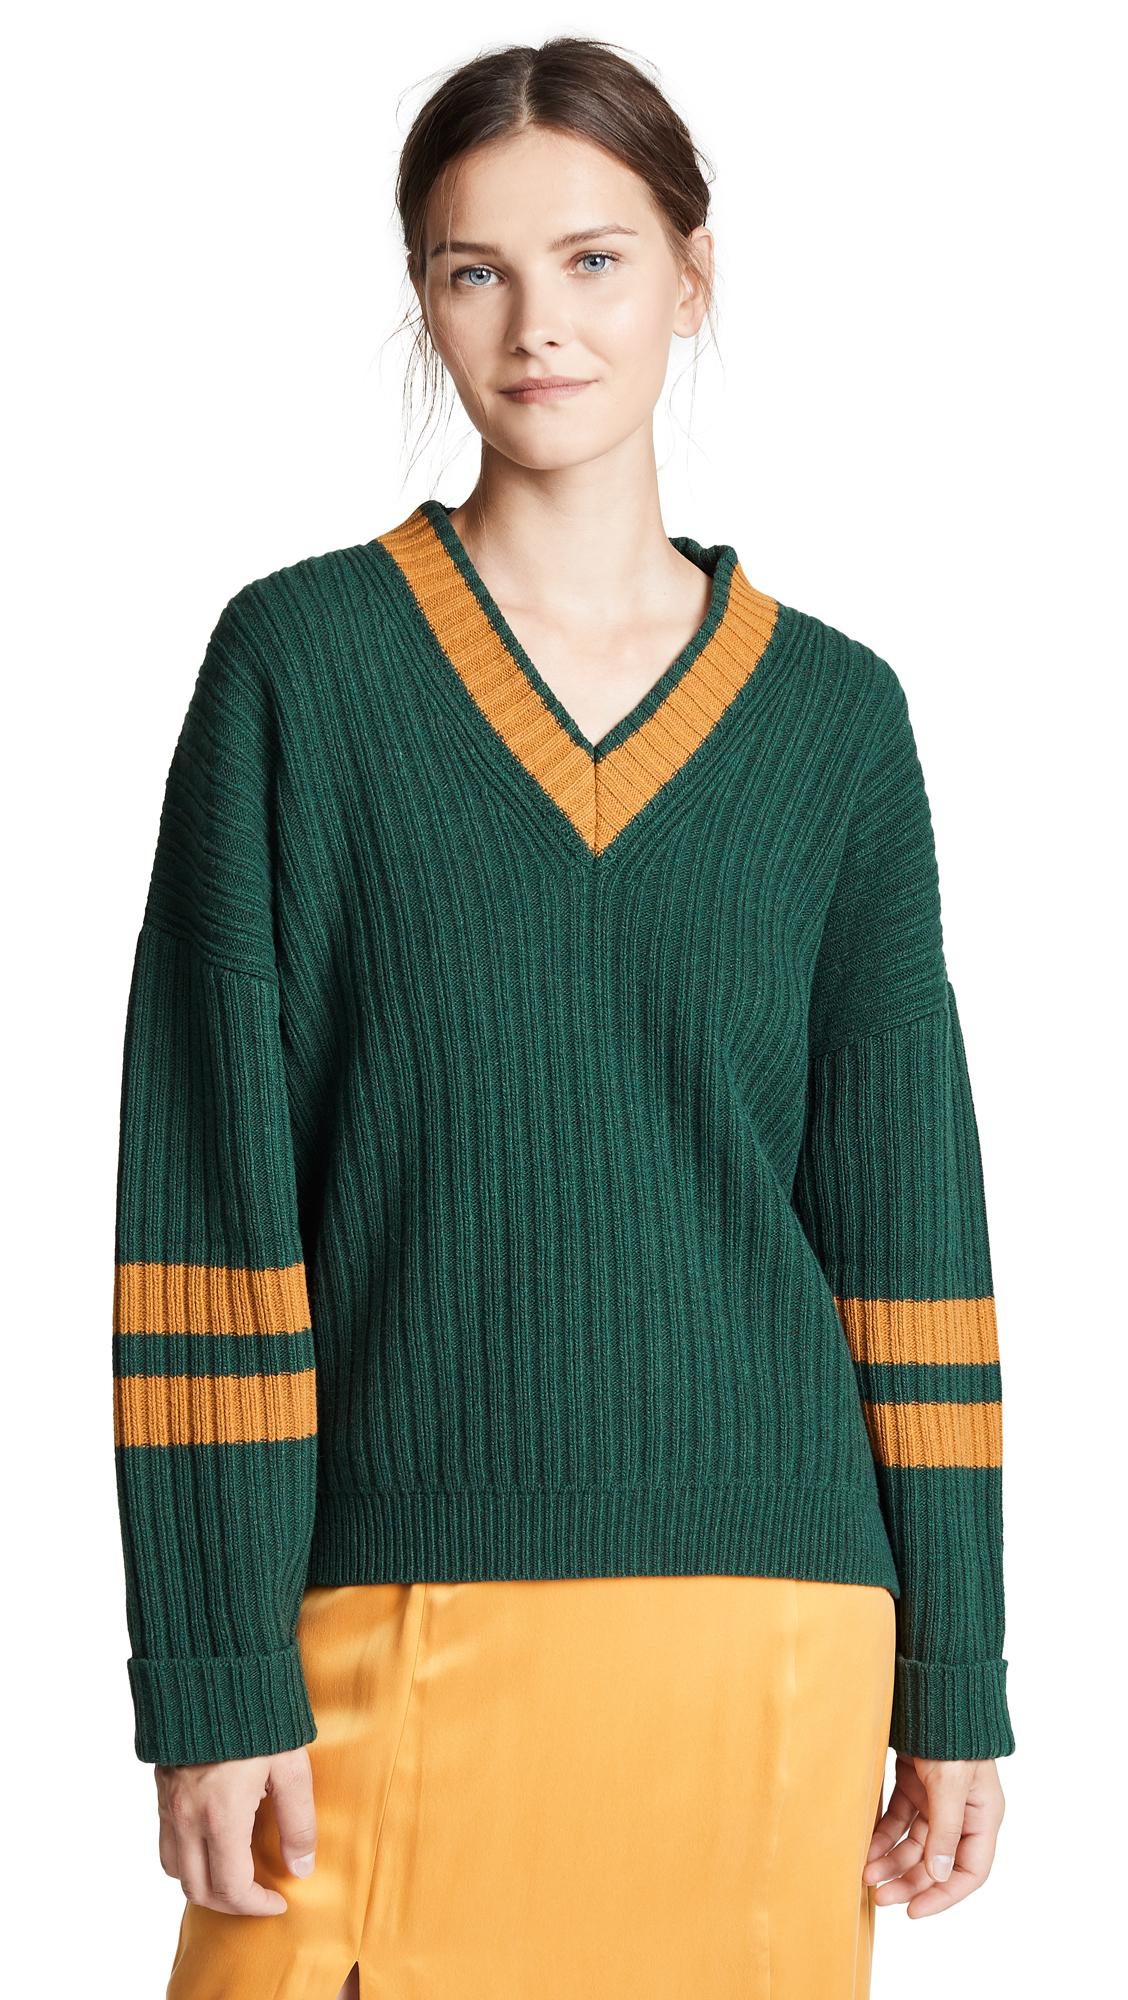 Paul Smith Varsity Sweater In Green